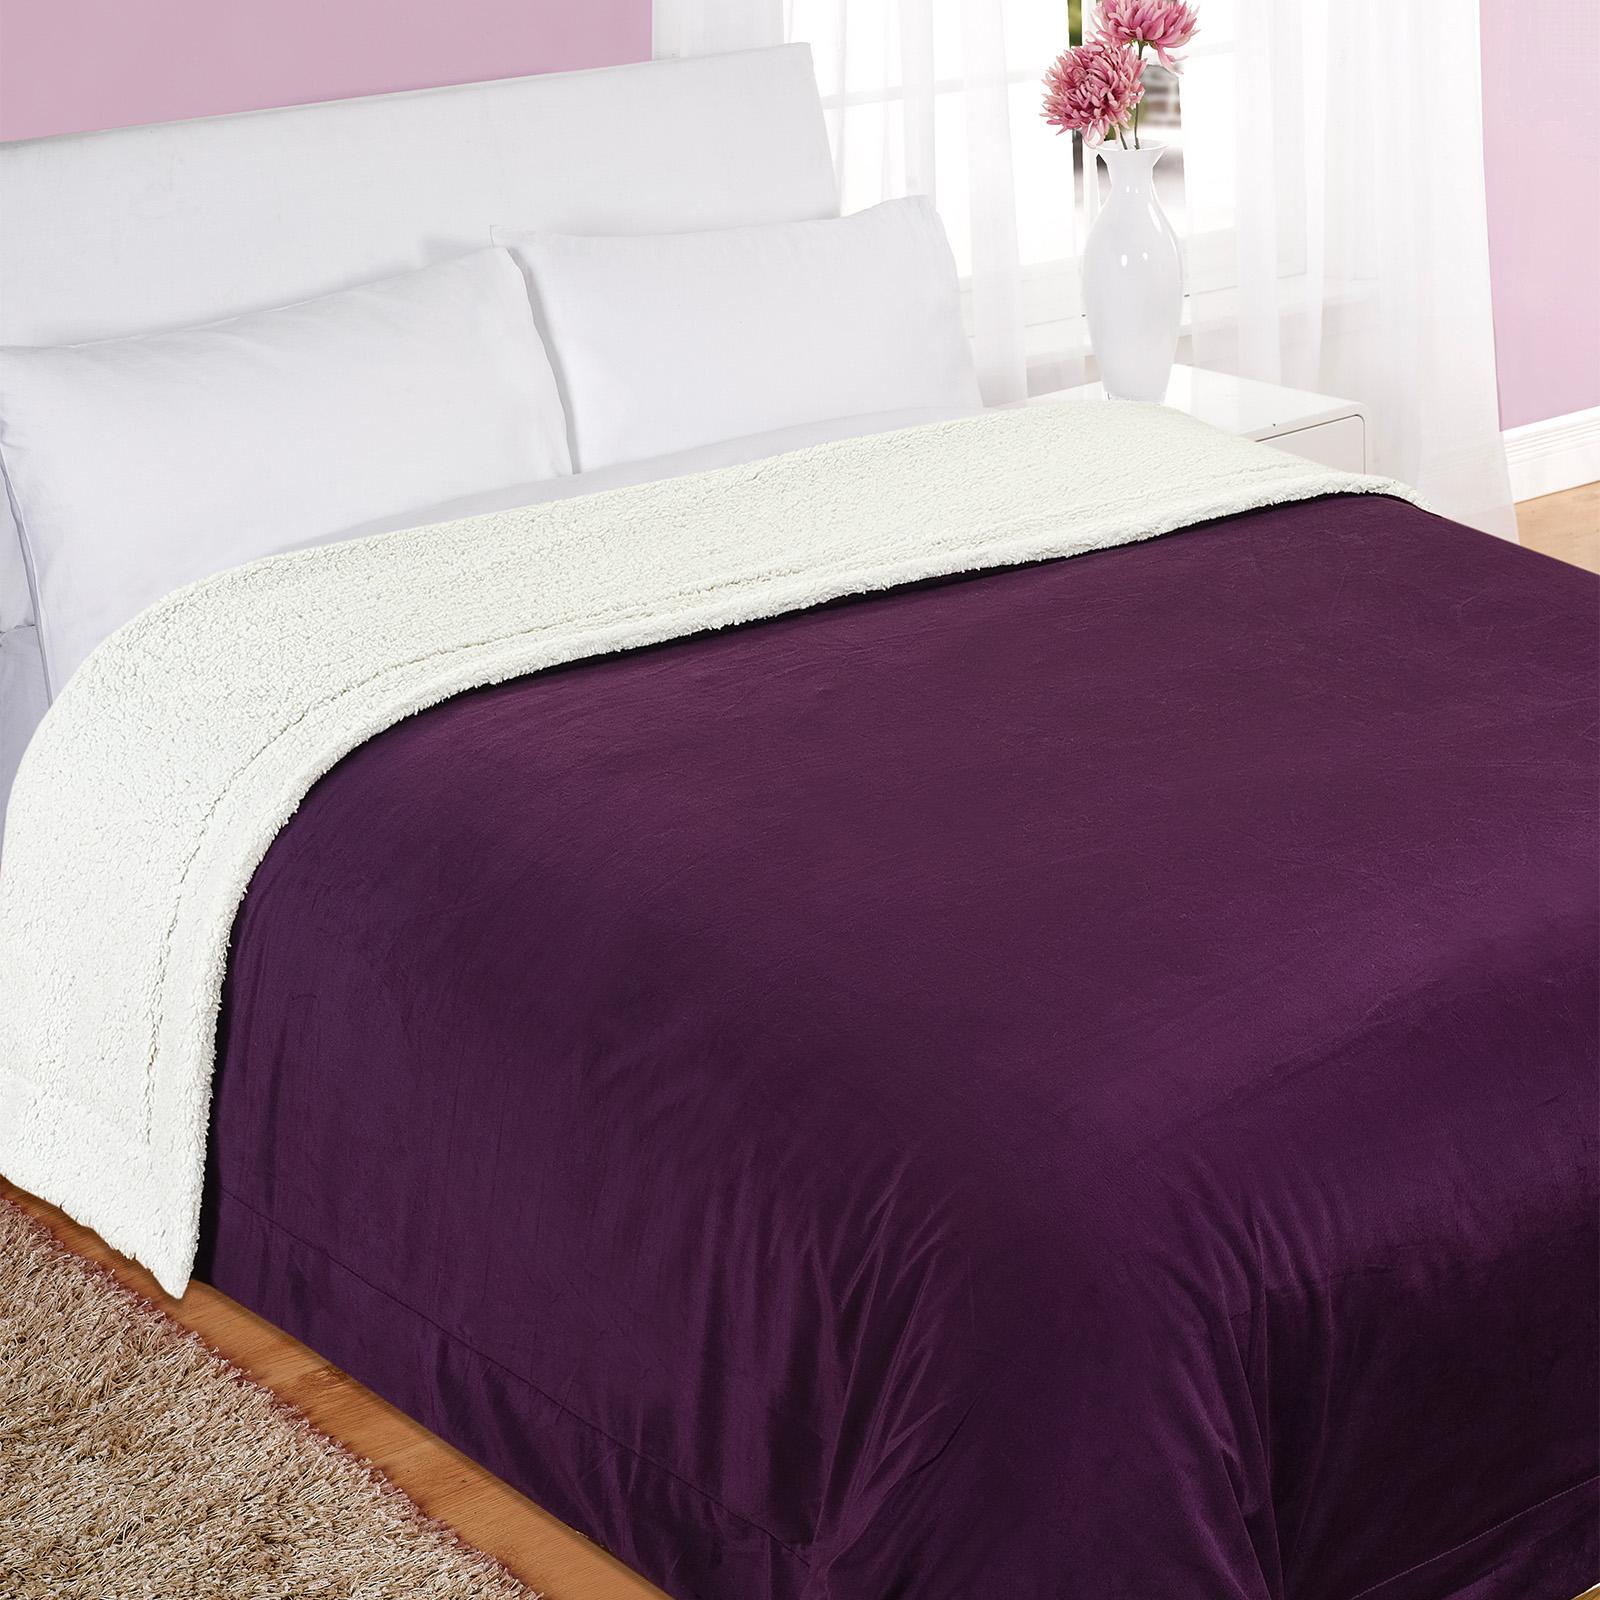 dreamscene luxury large snuggle soft teddy sherpa throw over blanket king size. Black Bedroom Furniture Sets. Home Design Ideas